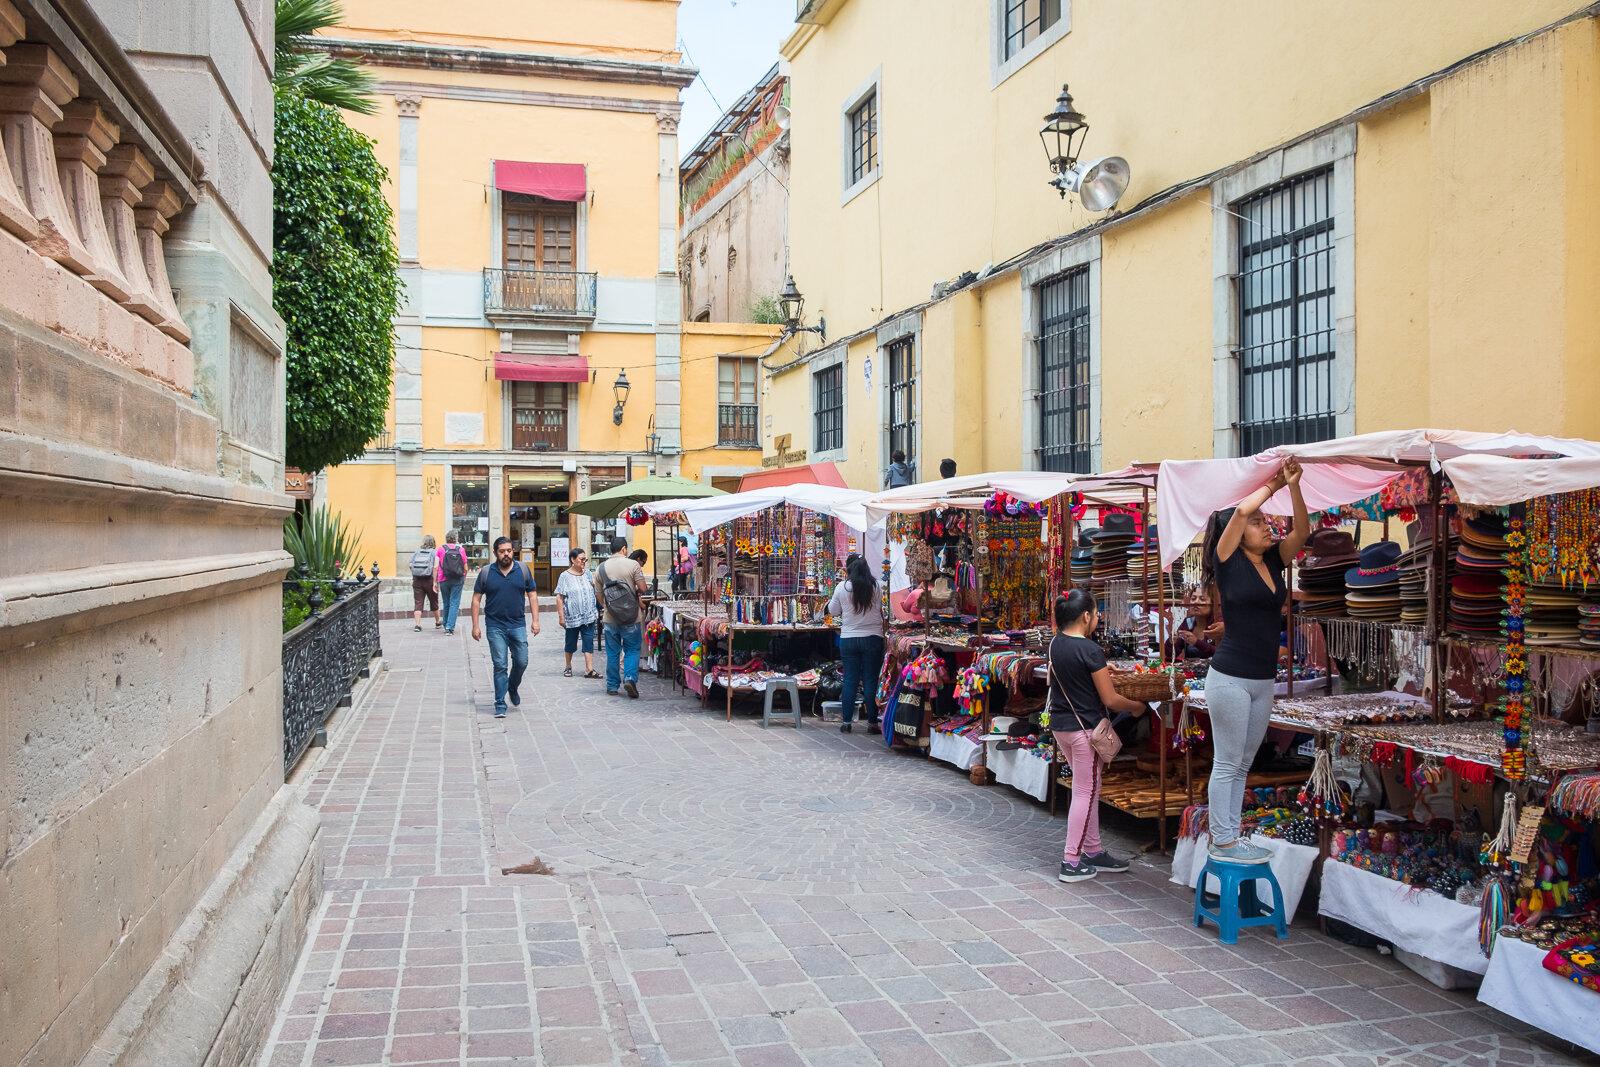 Colorful vendor stalls